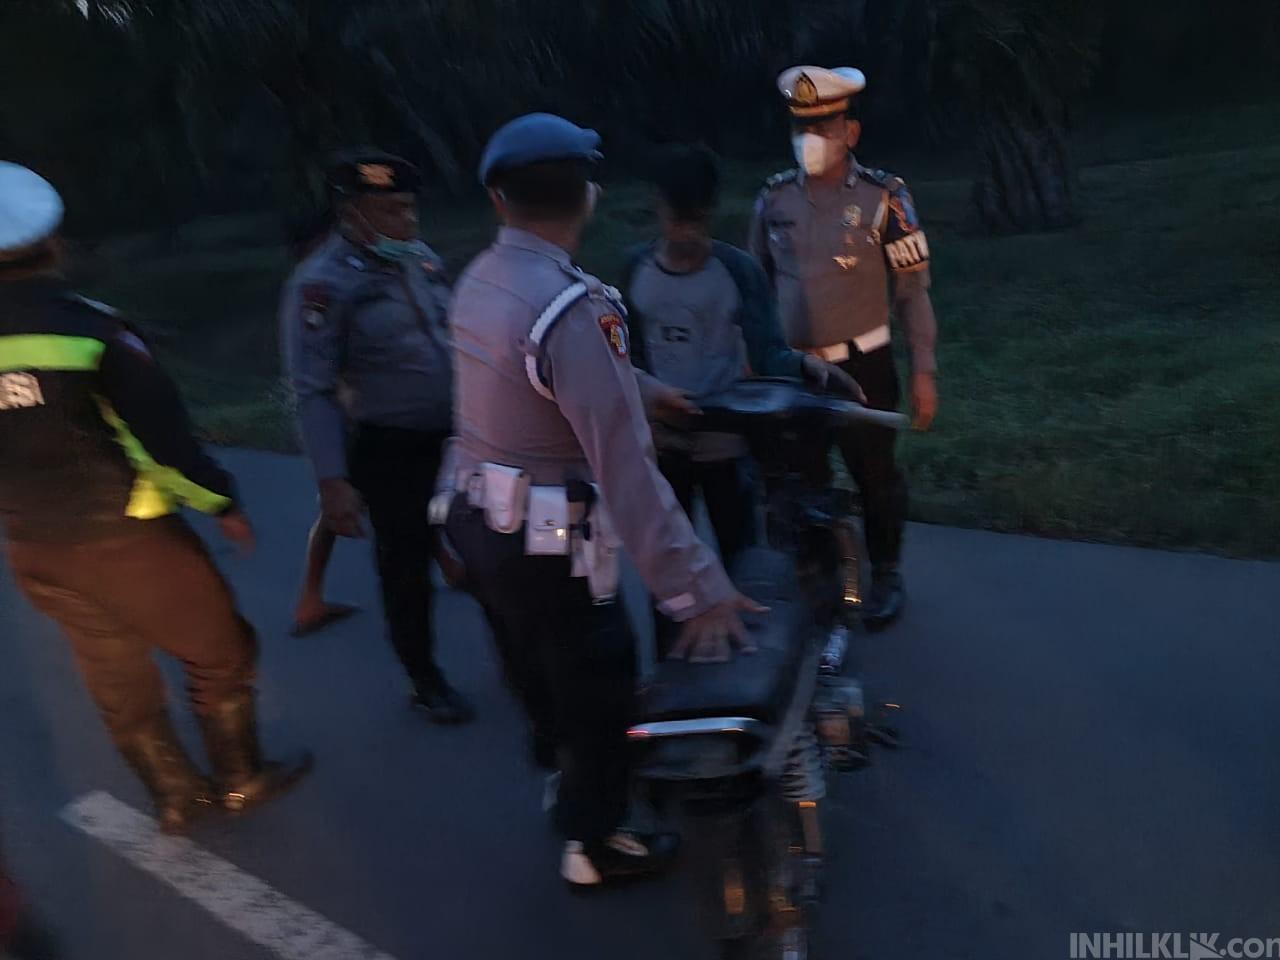 Patroli Asmara Subuh di Jalan Matapao- Sei Rampah, Sepeda Motor Tanpa Dokumen Diamankan Polisi